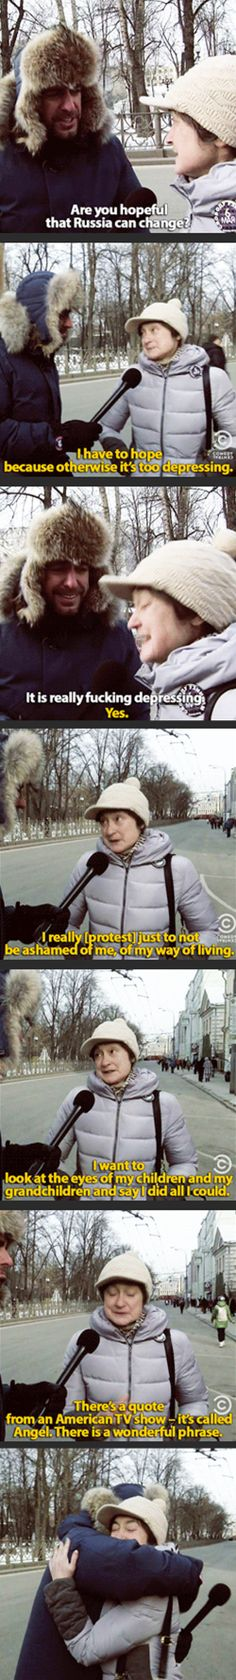 Jason Jones talks to a Russian woman protesting…